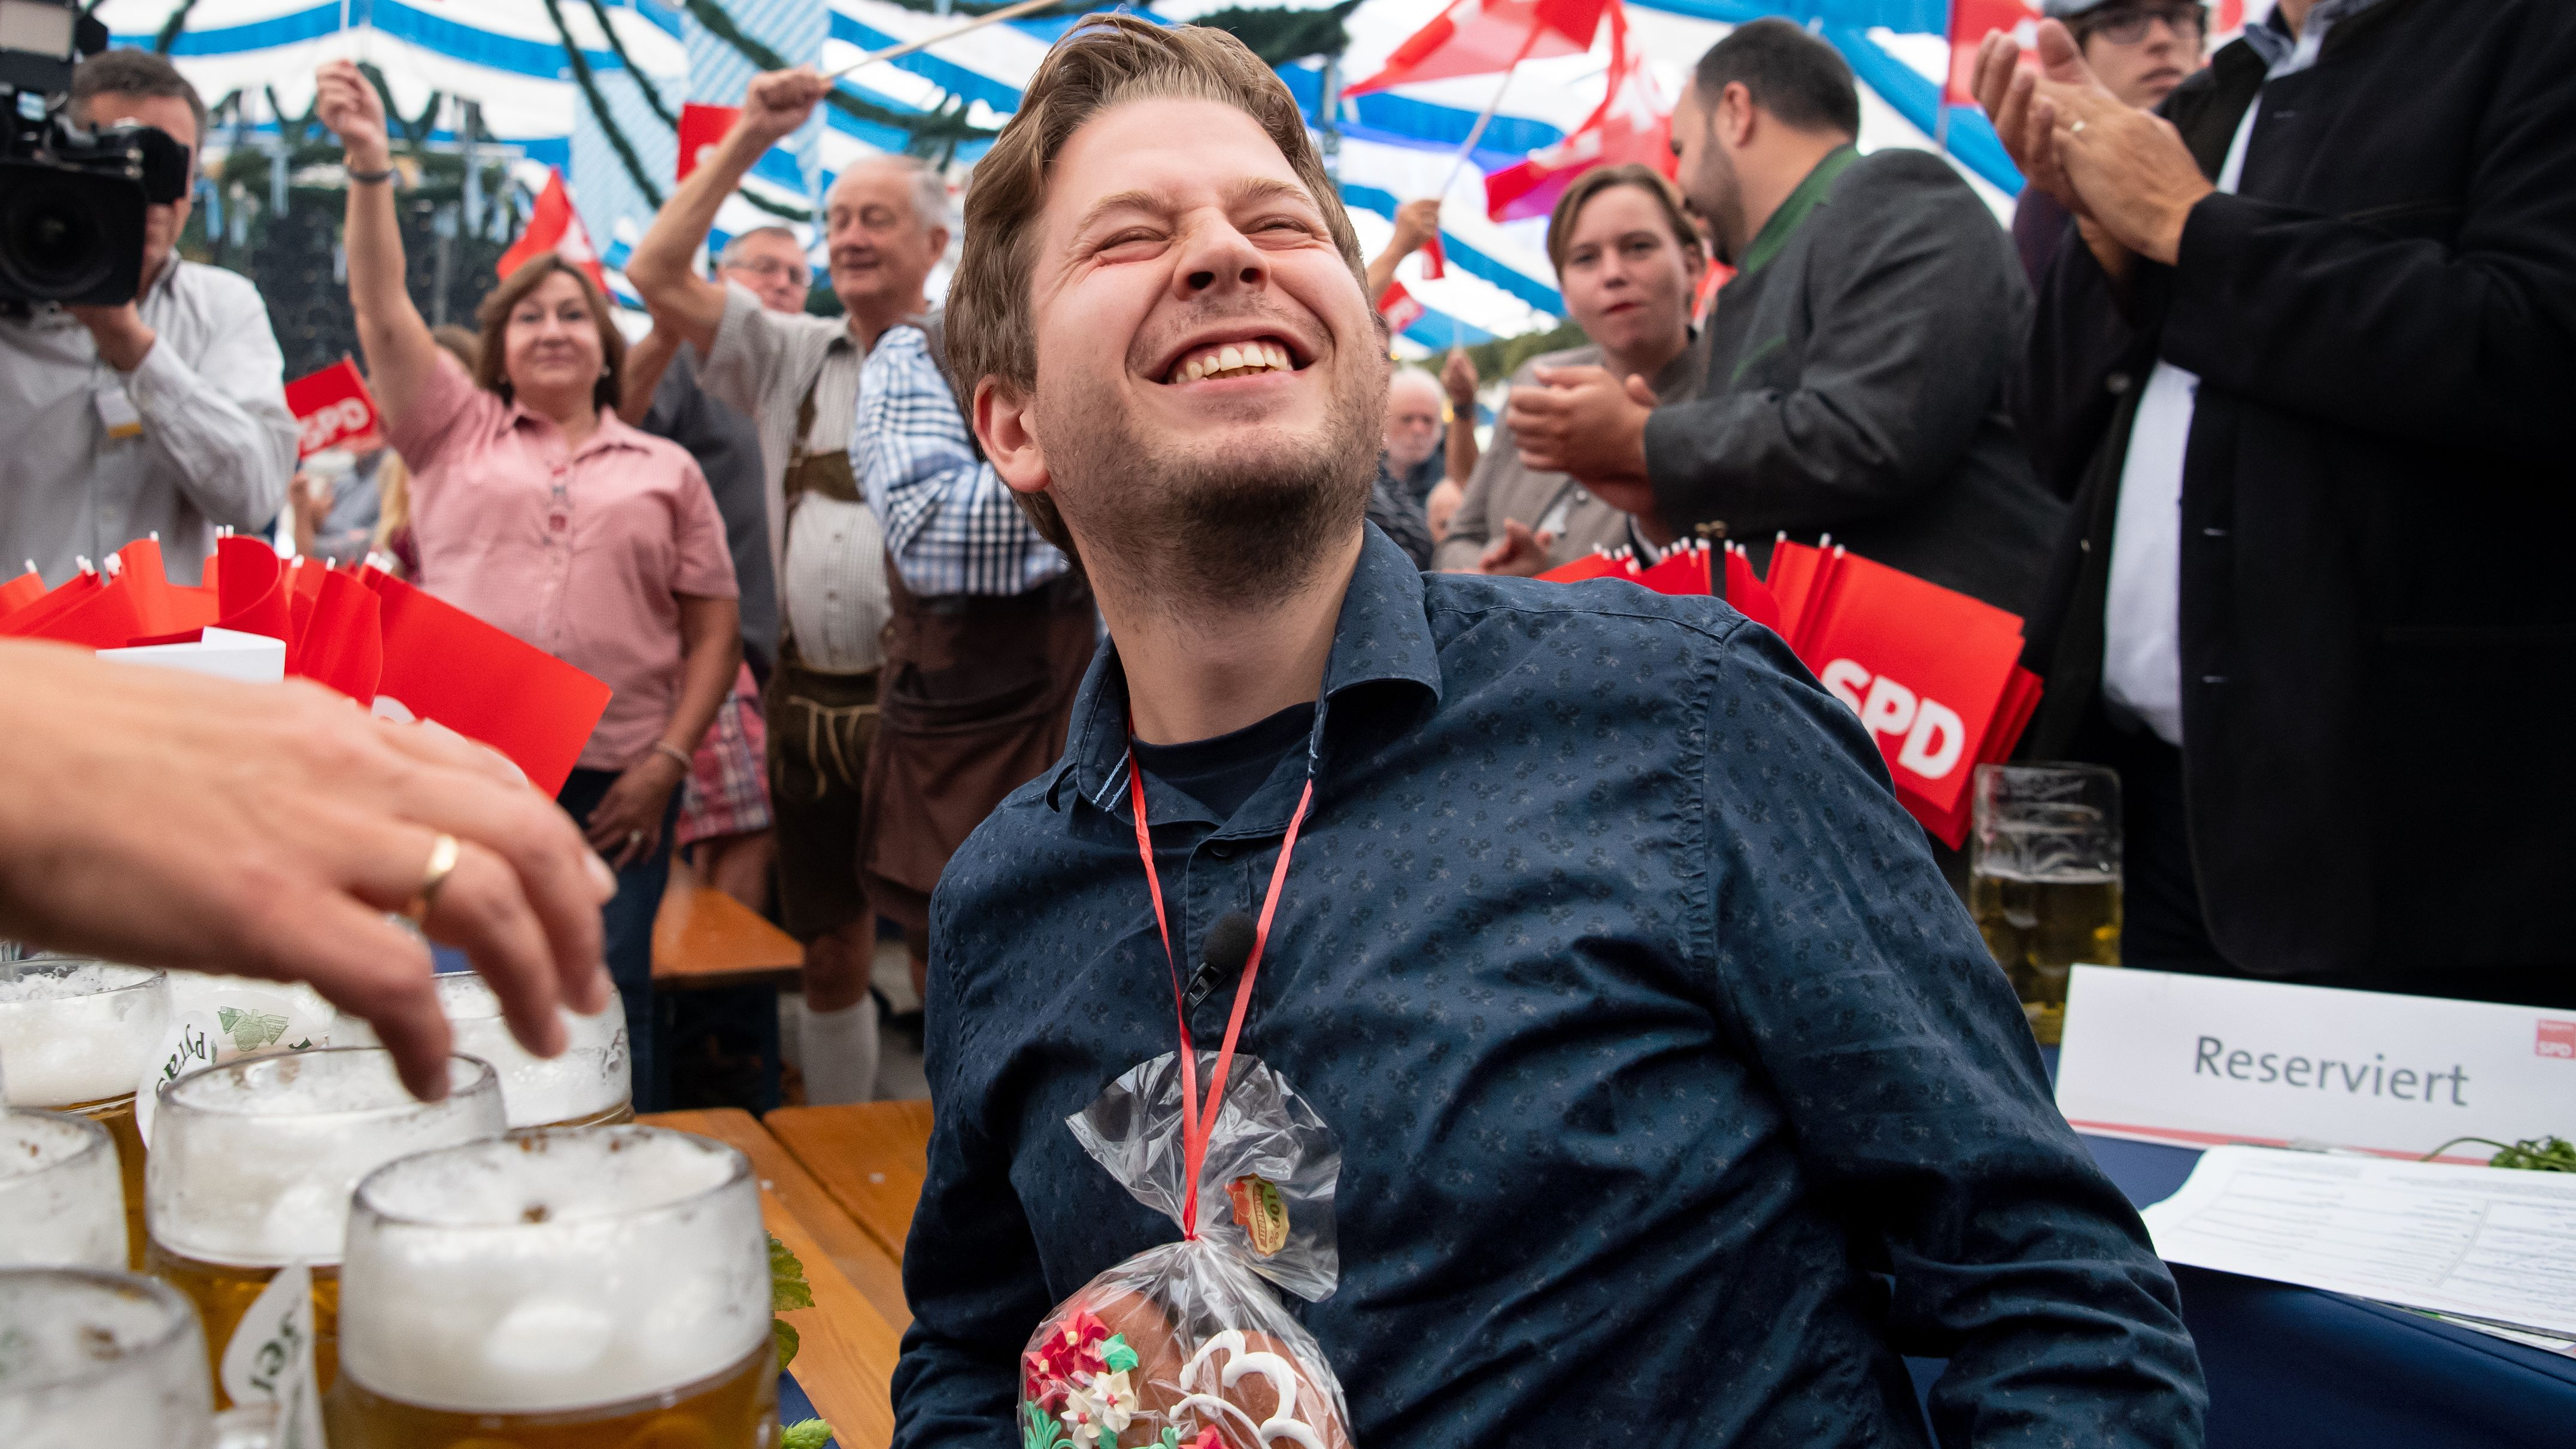 Juso-Chef Kevin Kühnert im SPD-Festzelt beim Gillamoos